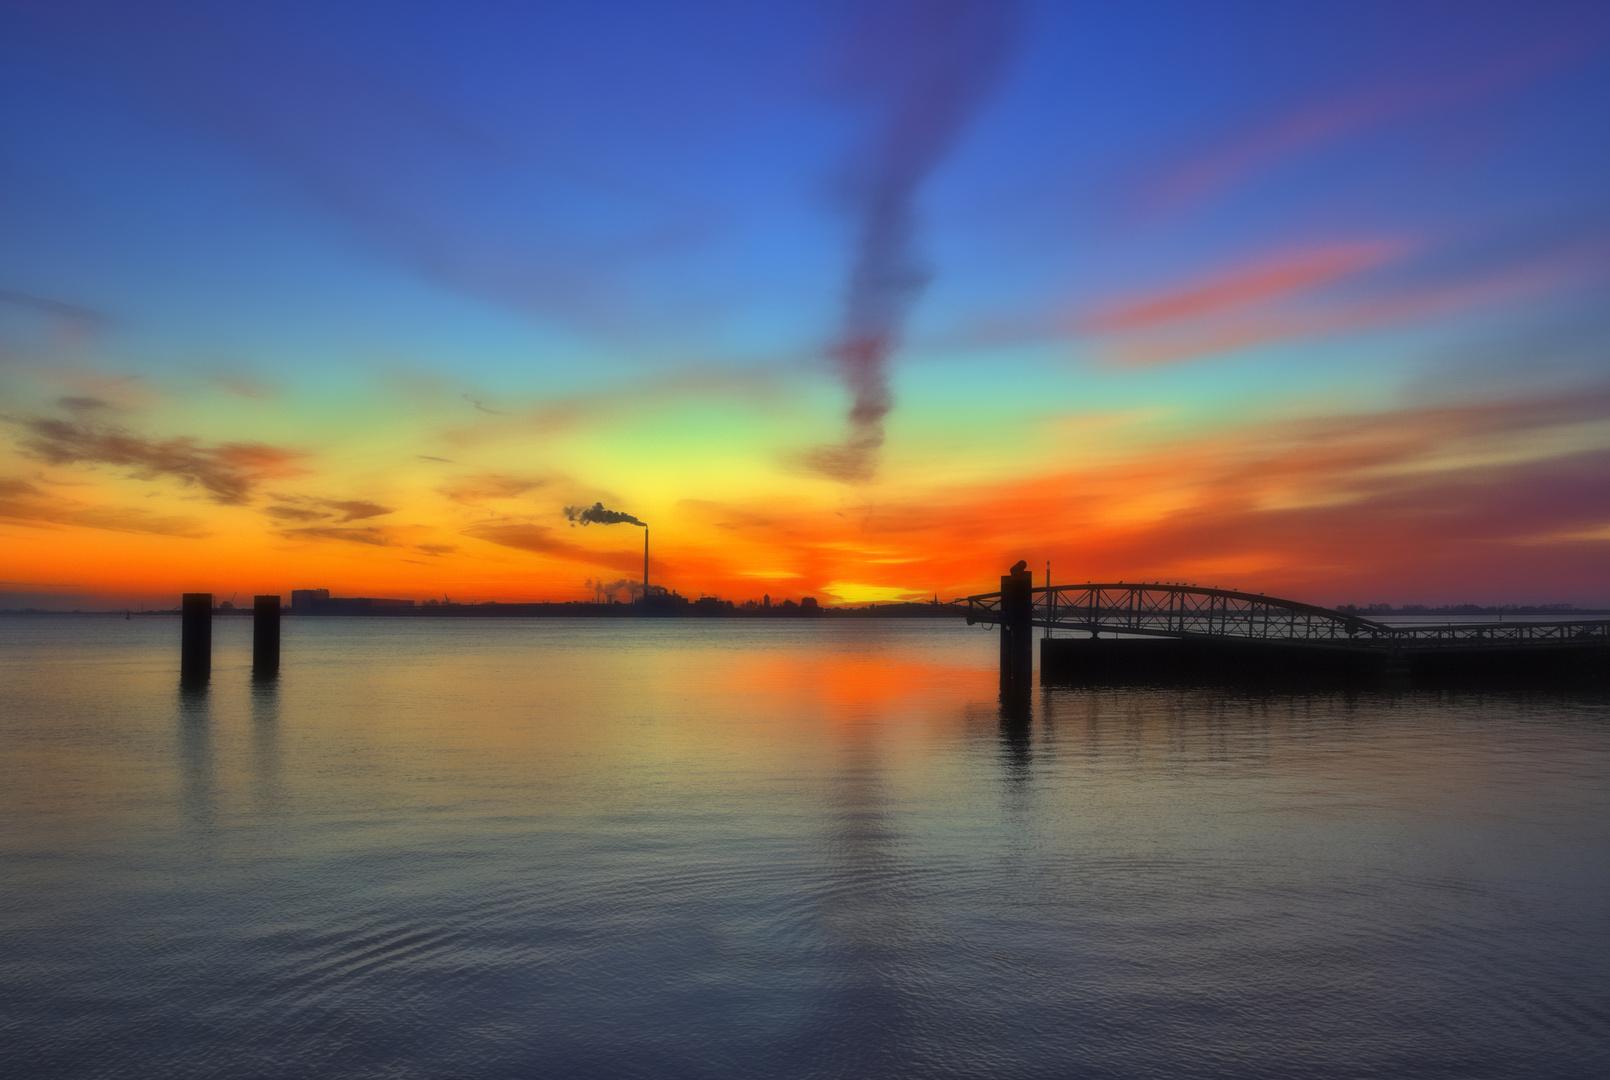 Bremerhaven 23.11.2013